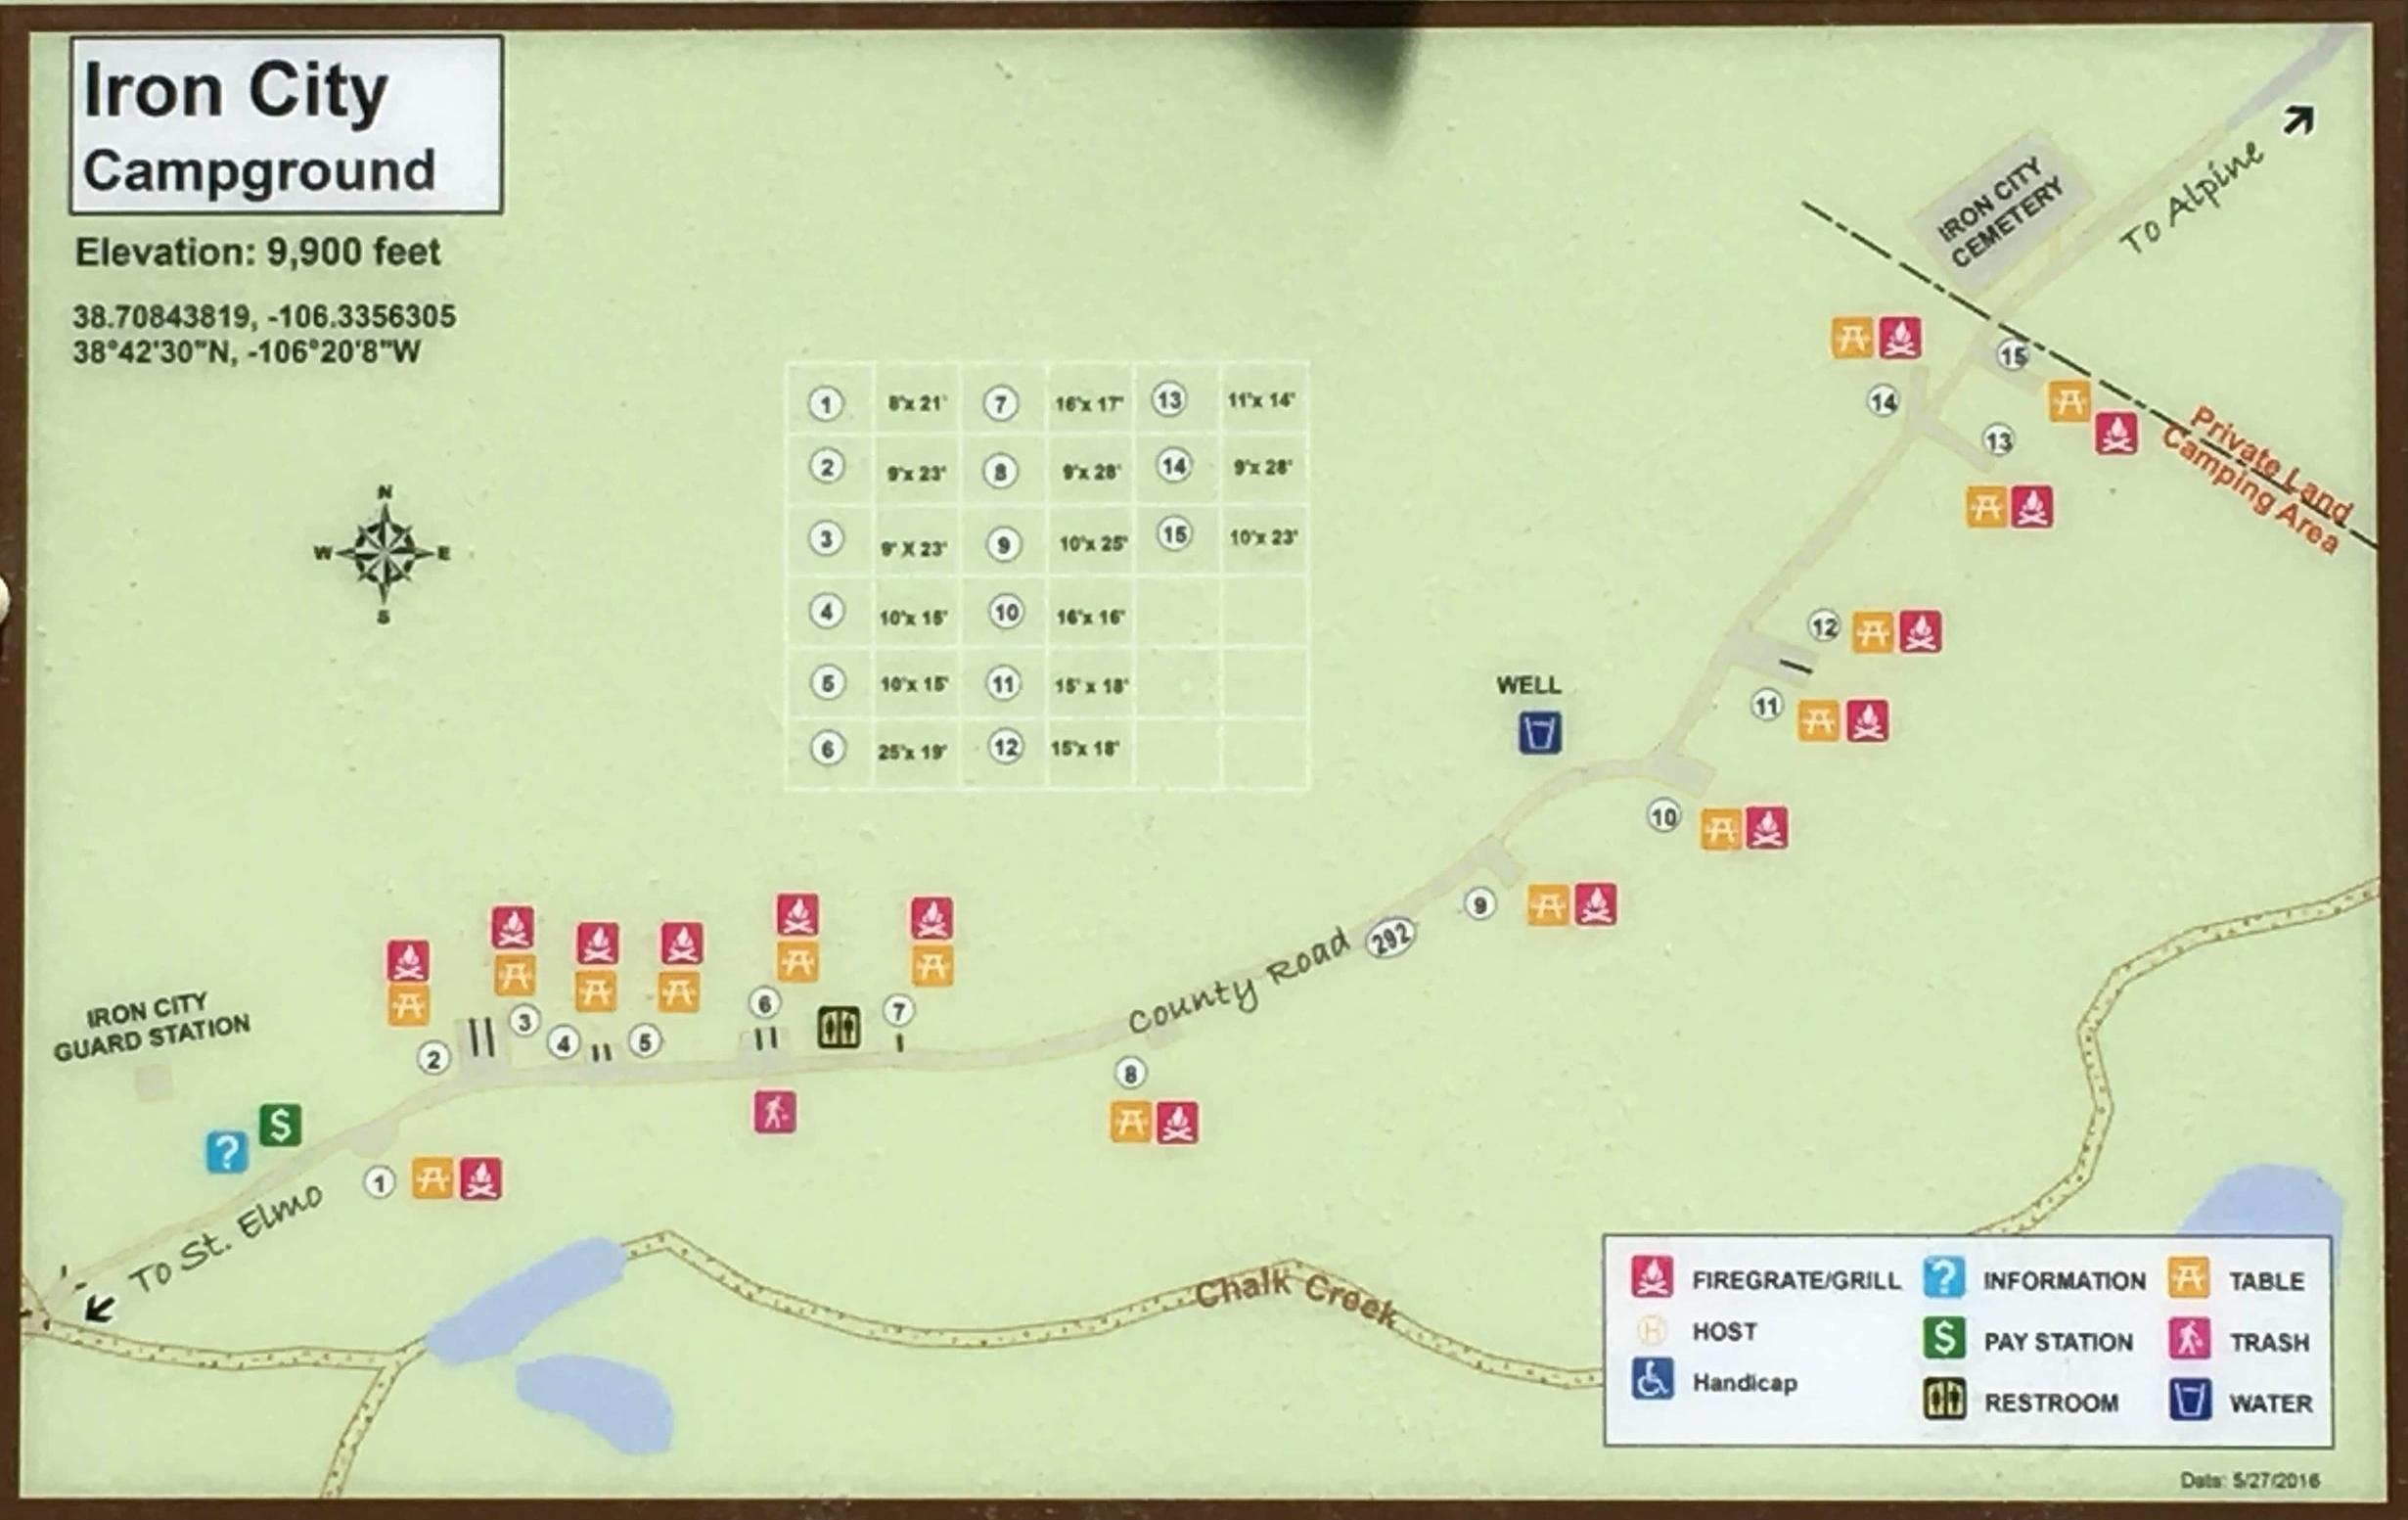 Iron City Campground Map